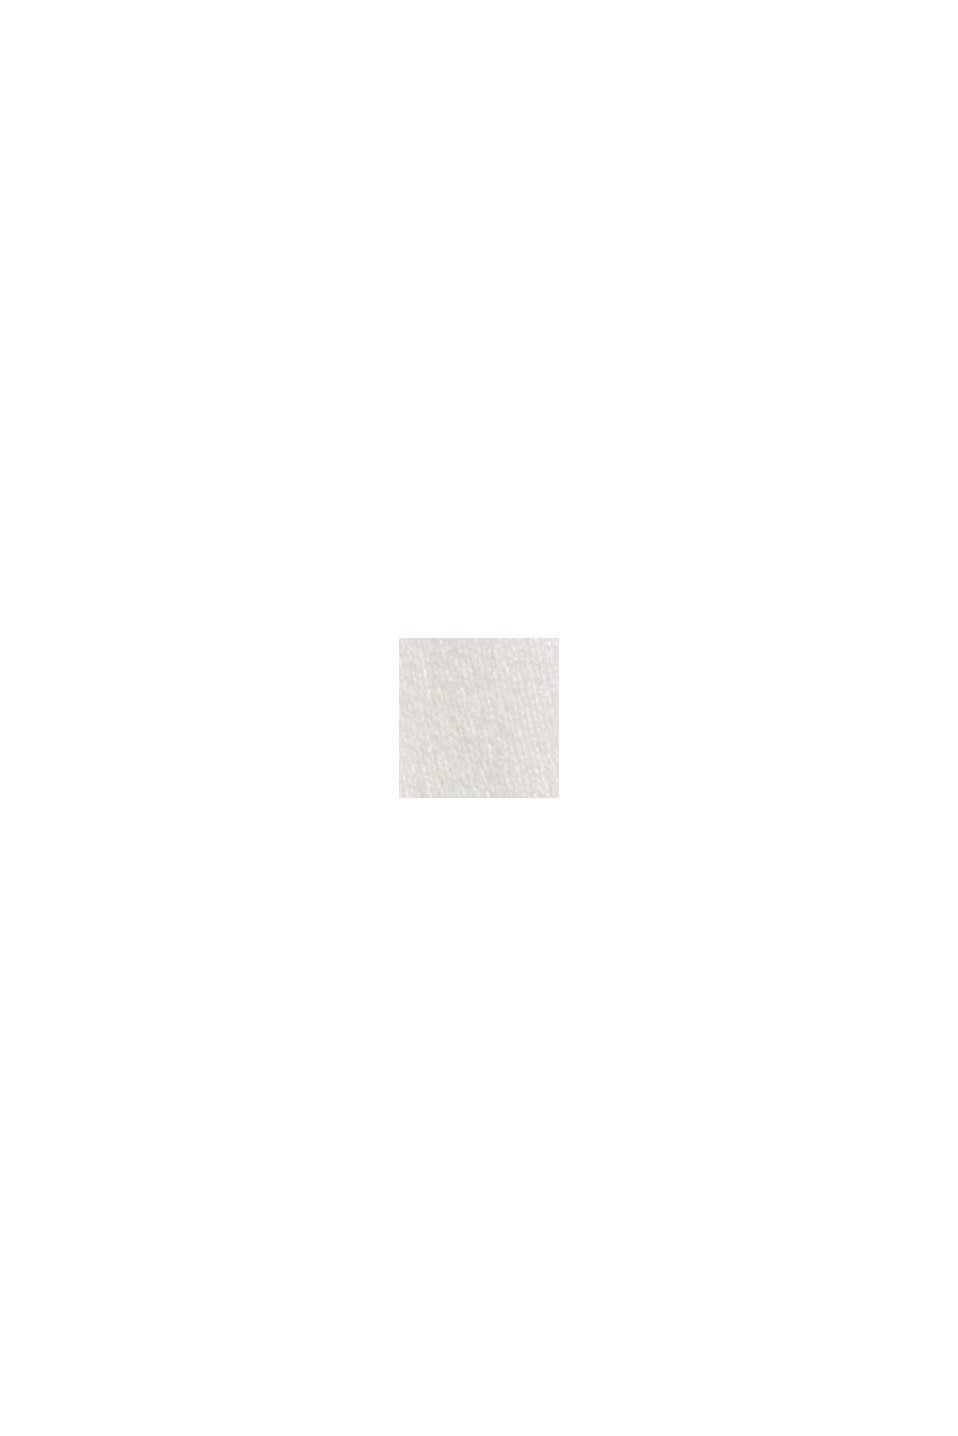 Longlseeve mit Tasselbändern, LENZING™ ECOVERO™, OFF WHITE, swatch